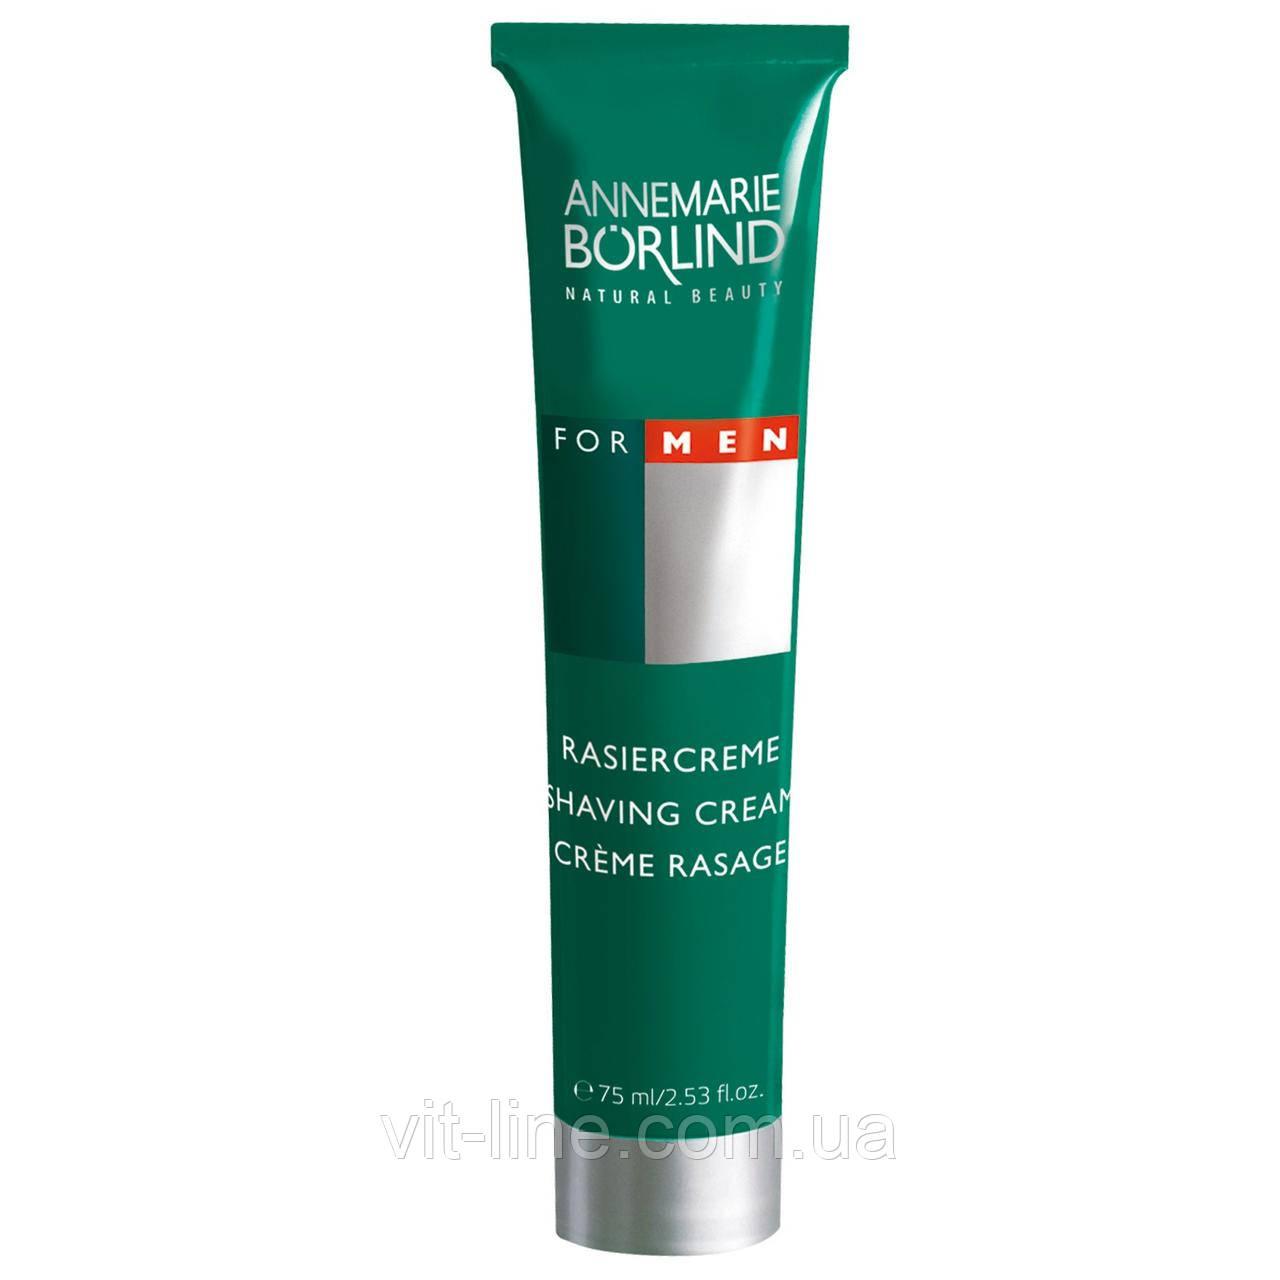 AnneMarie Borlind, Бережный крем для бритья, для мужчин, (75 мл)